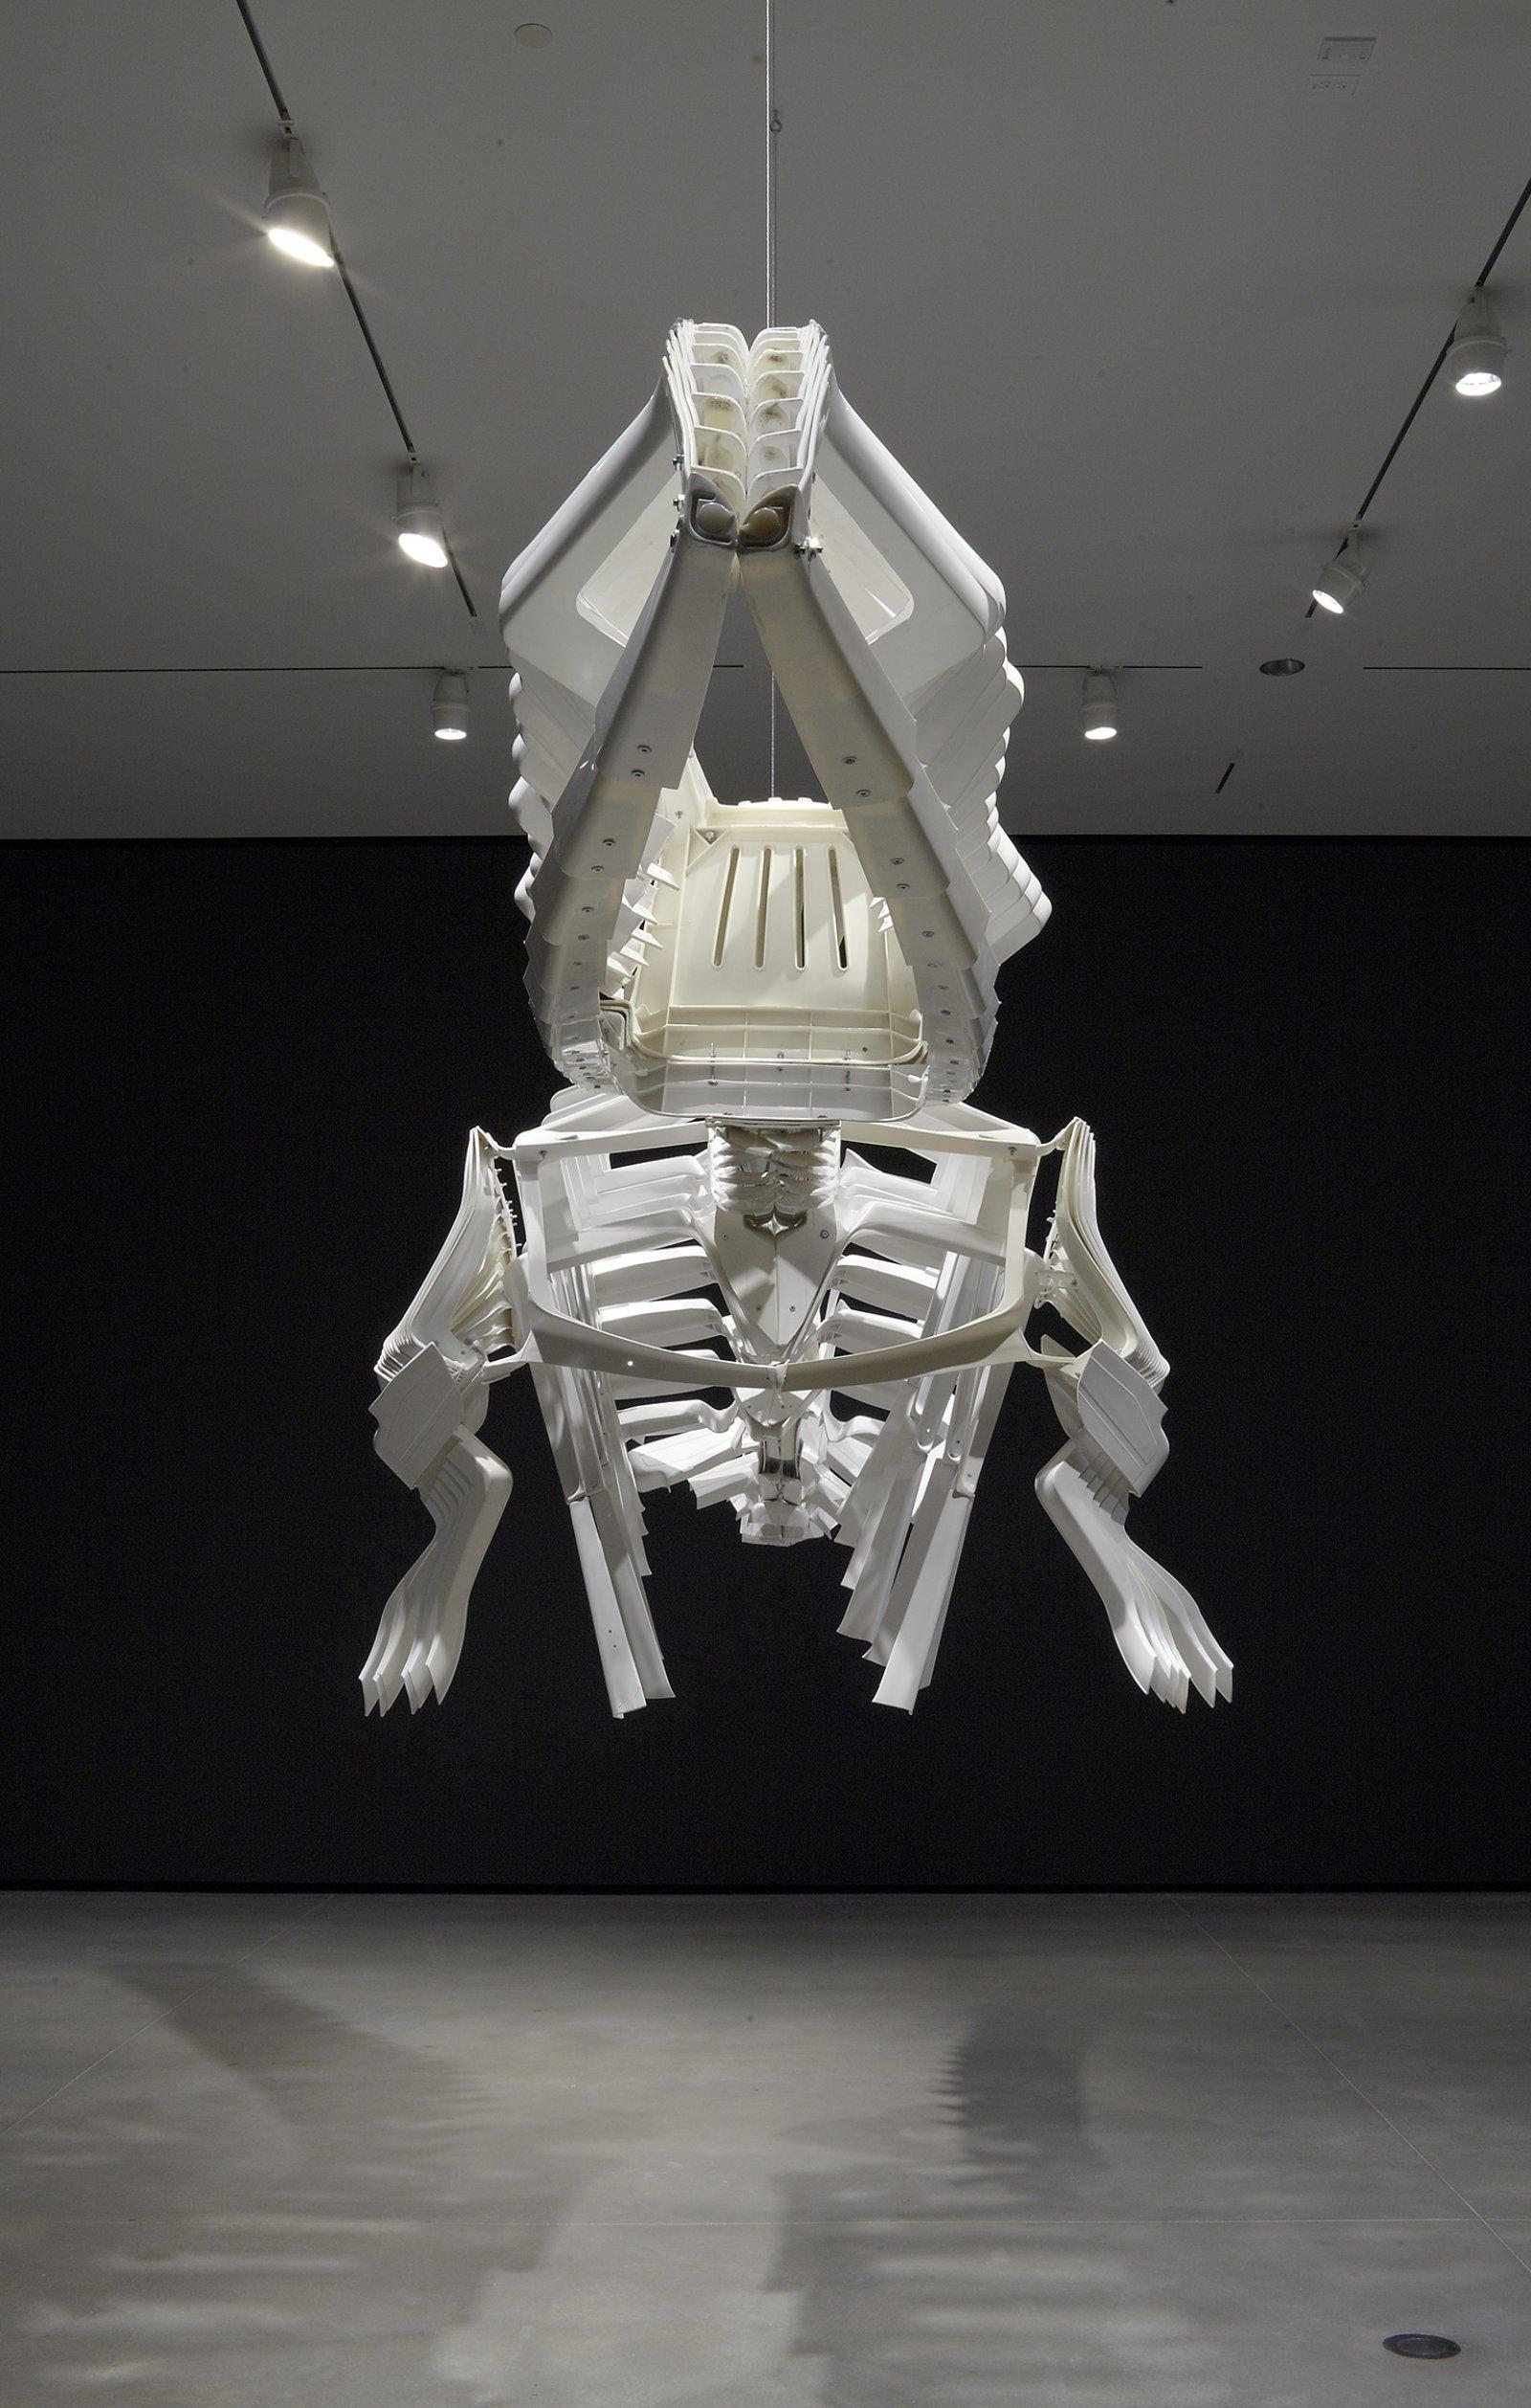 Brian Jungen,Shapeshifter, 2000, plastic chairs, 57 x 60 x 260 in. (145 x 152 x 660 cm). Installation view, Art Gallery of Alberta,Edmonton, AB, 2011